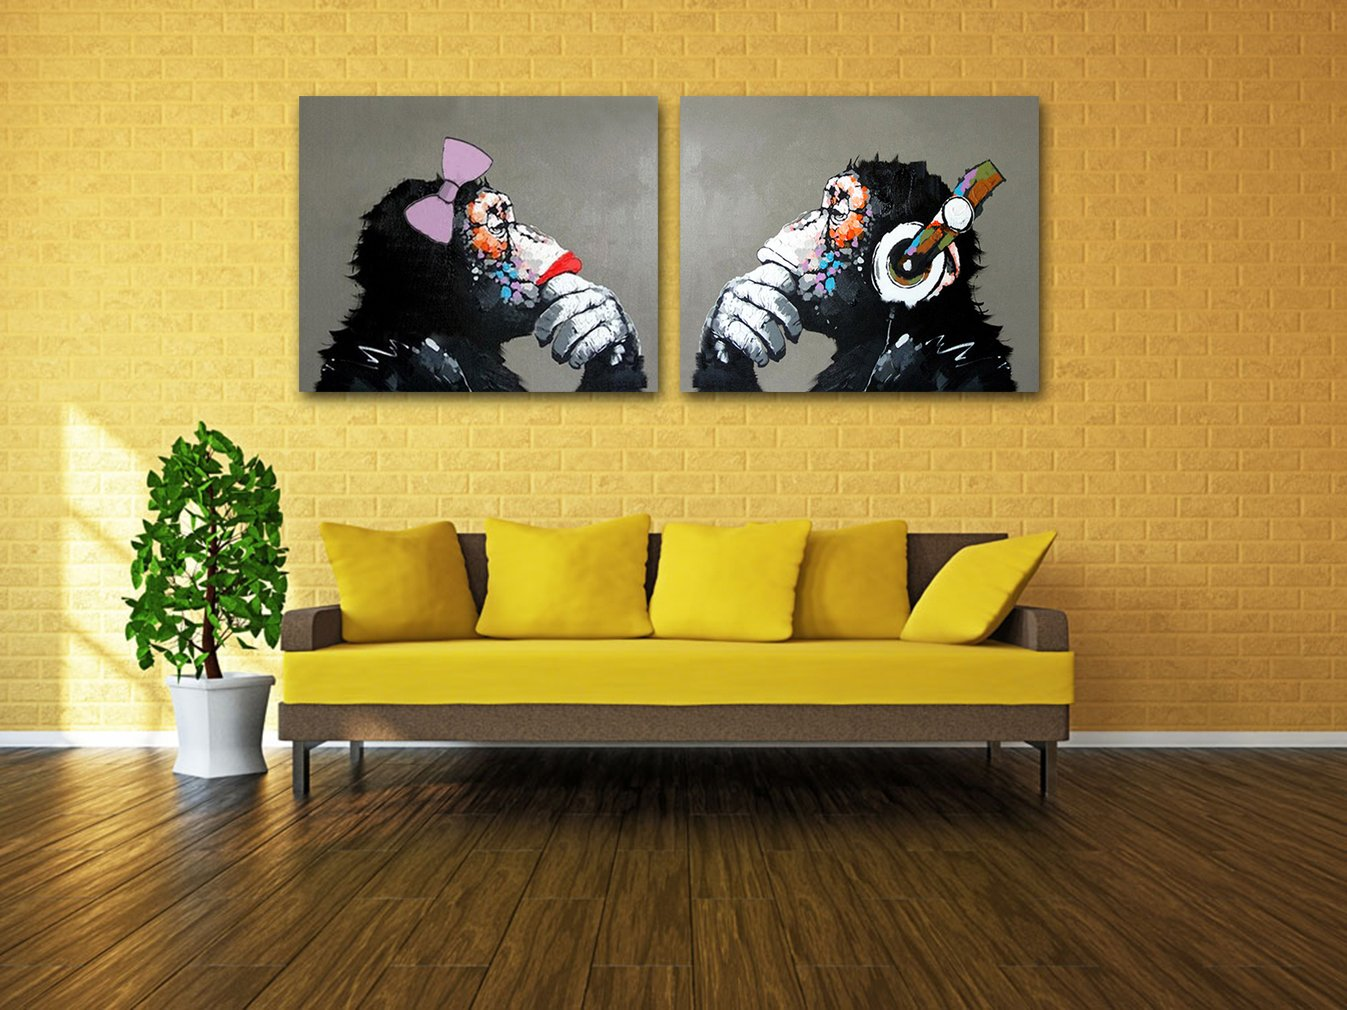 Muzagroo Art Gorilla with Headphone Oil Painting Hand Painted Art on ...